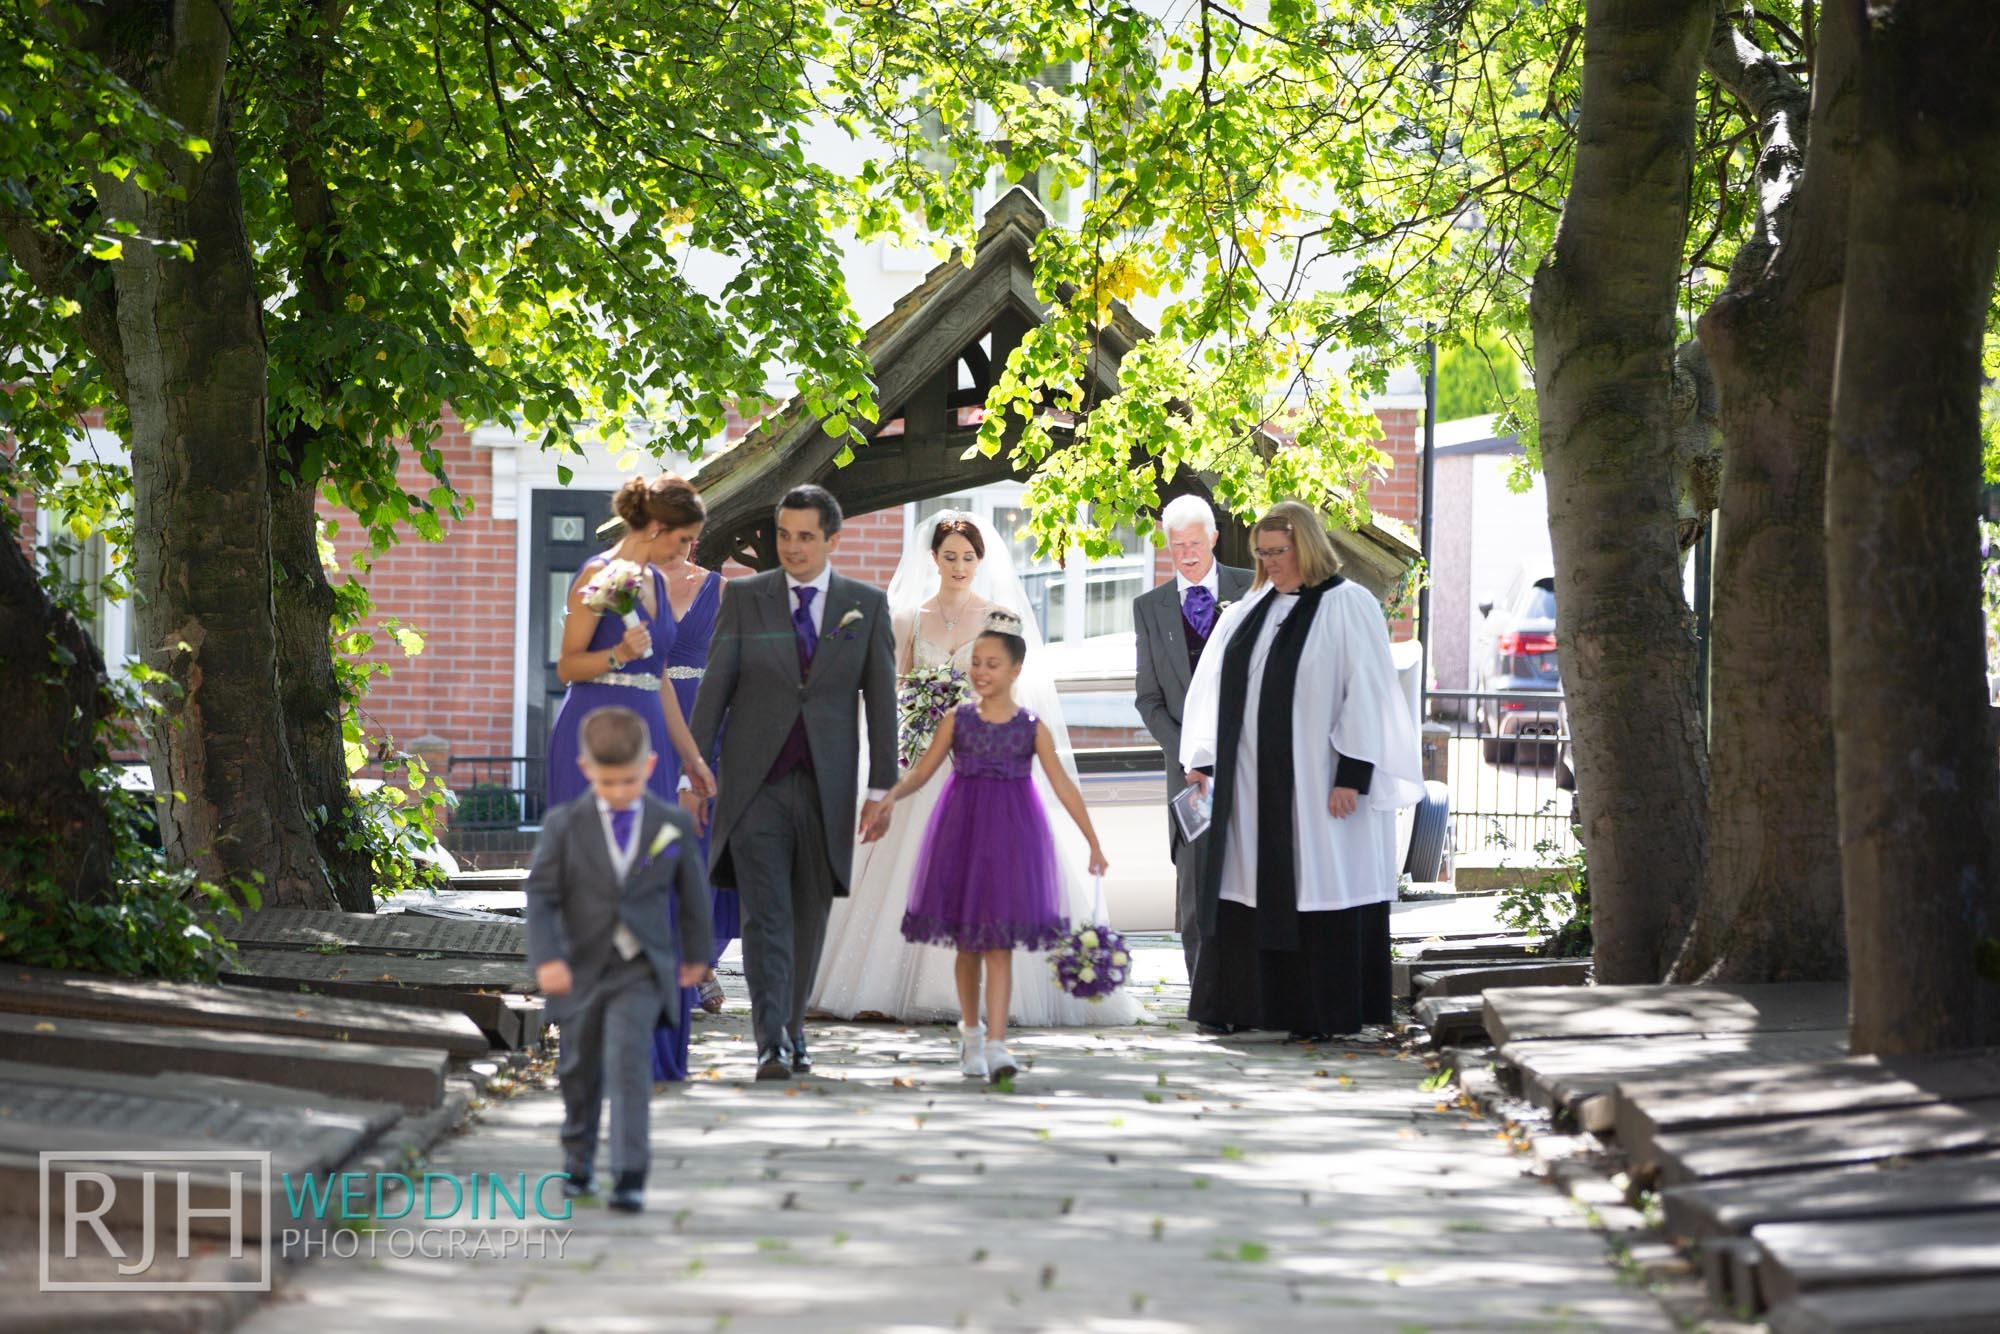 Oulton Hall Wedding Photography_Goodwill-Hall_018_RJH17220.jpg